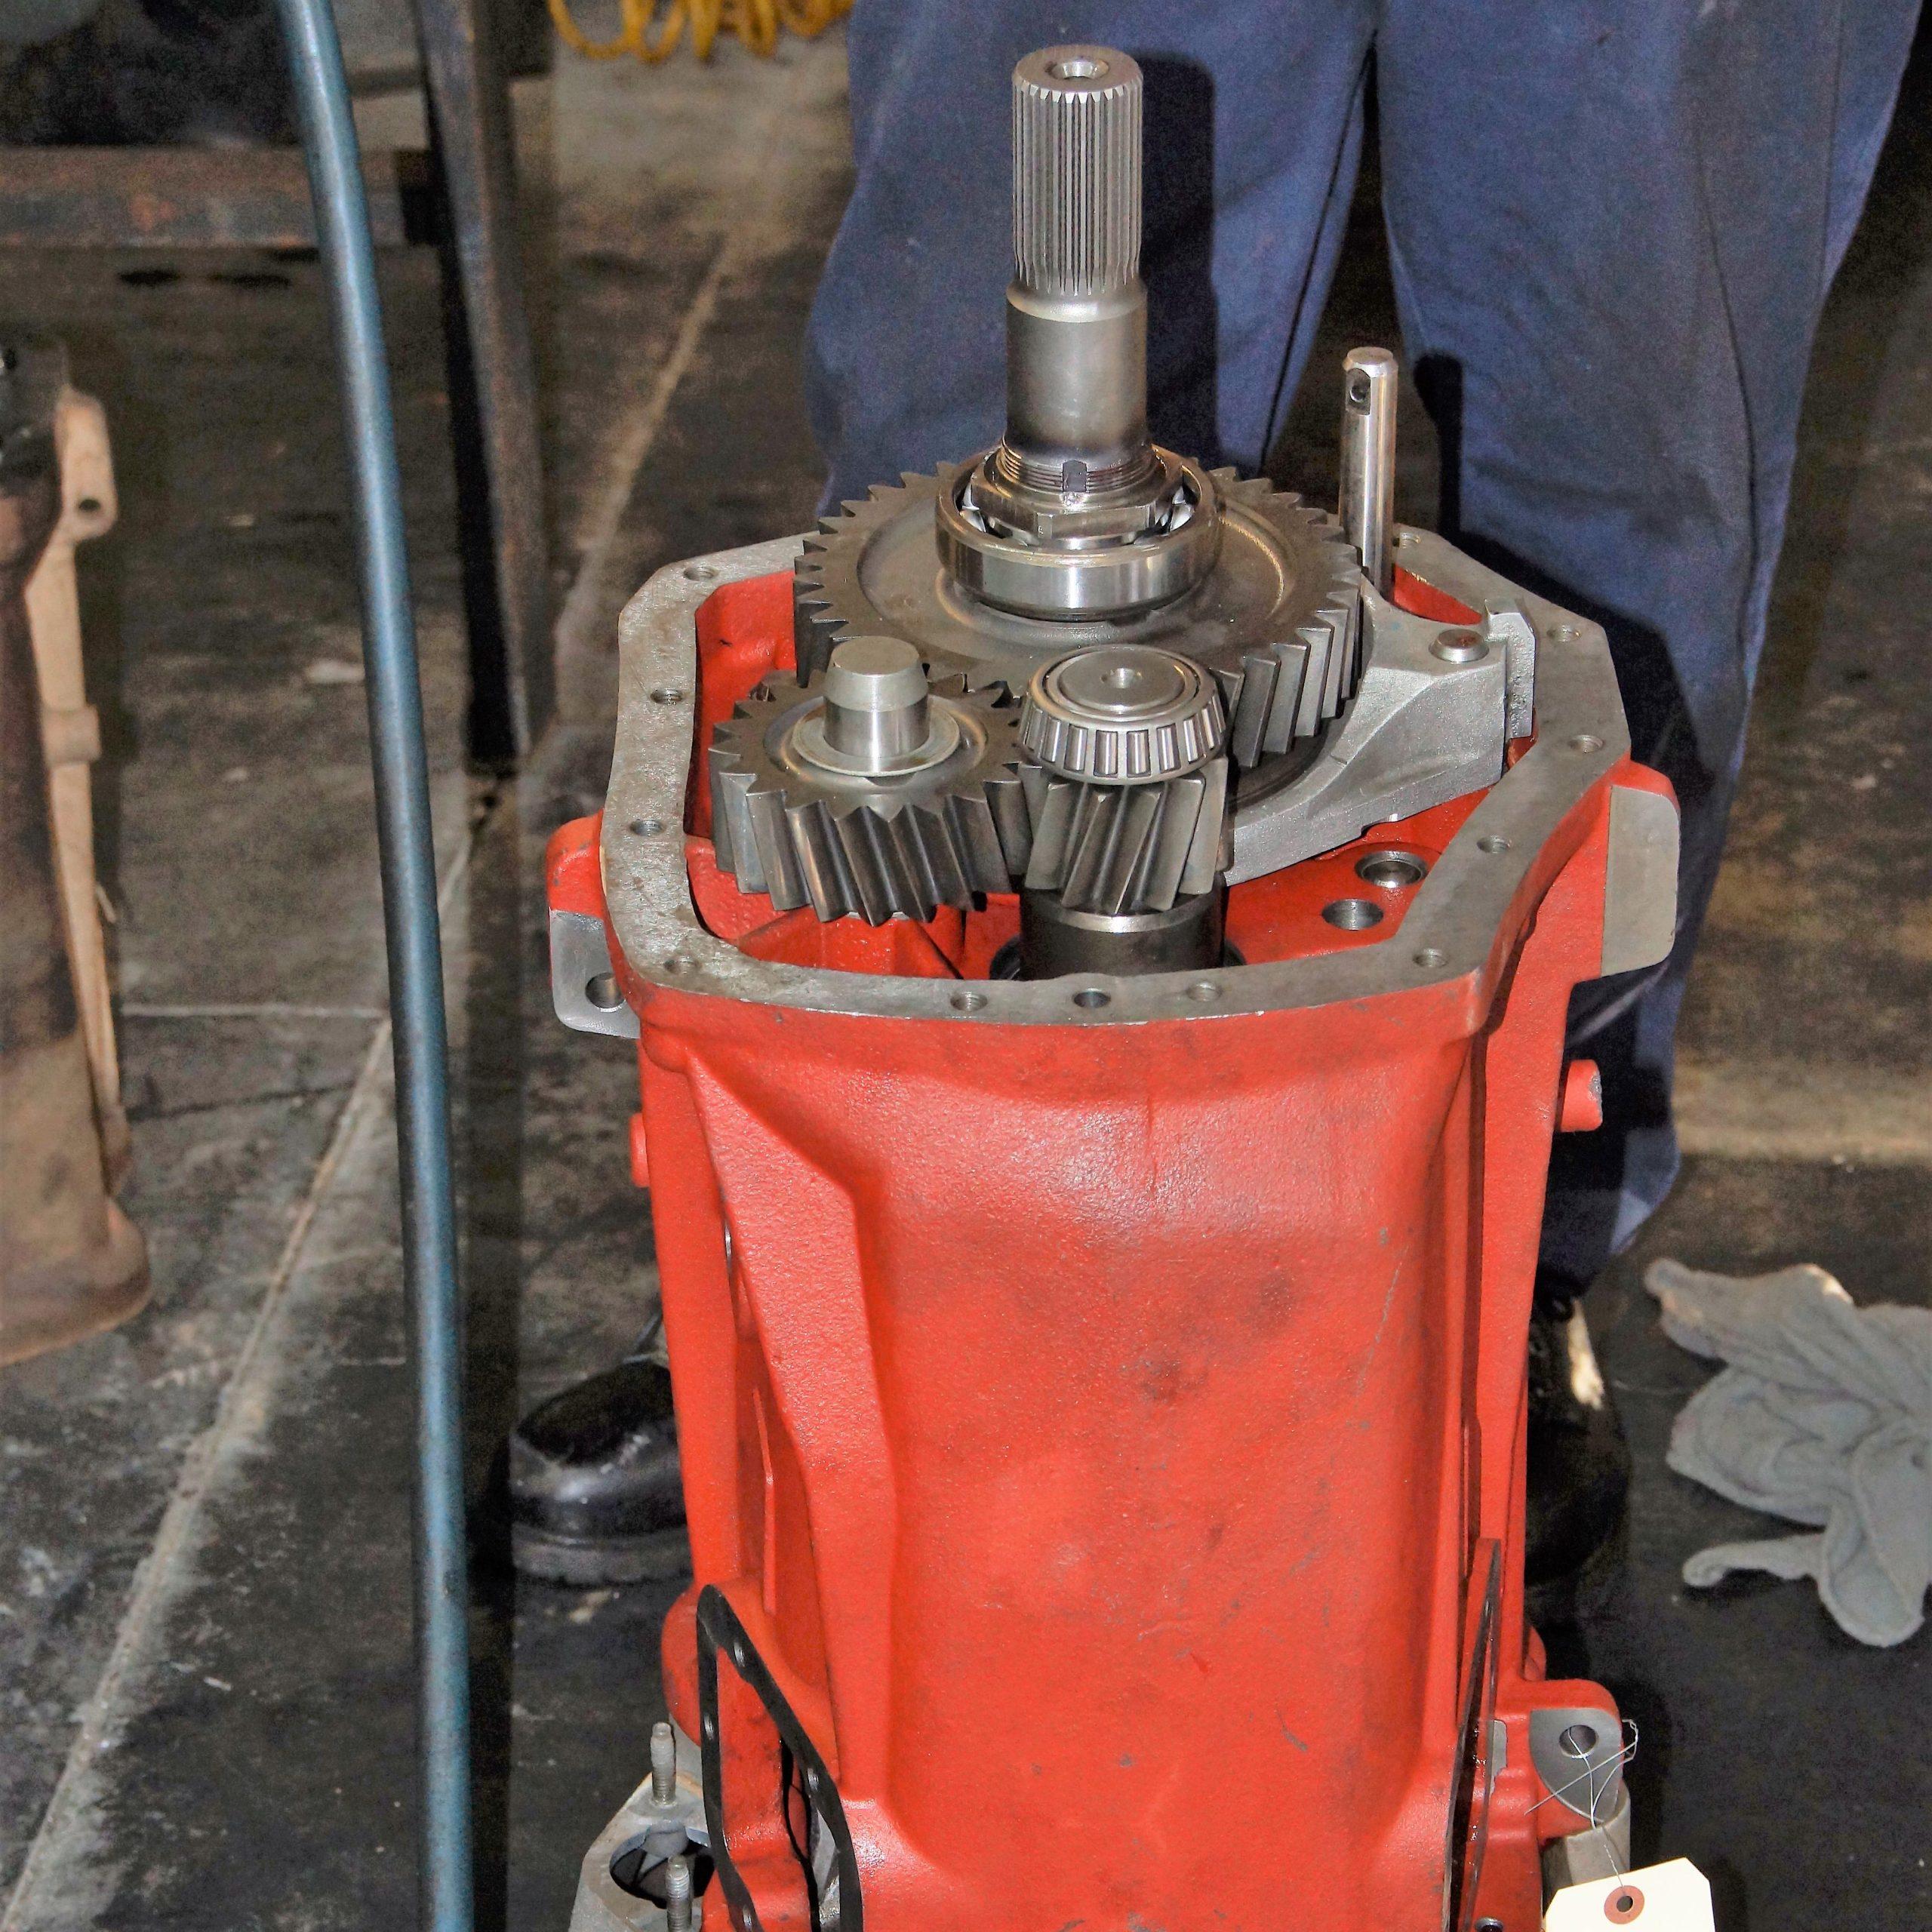 American Five Star Auto Repair & Transmission